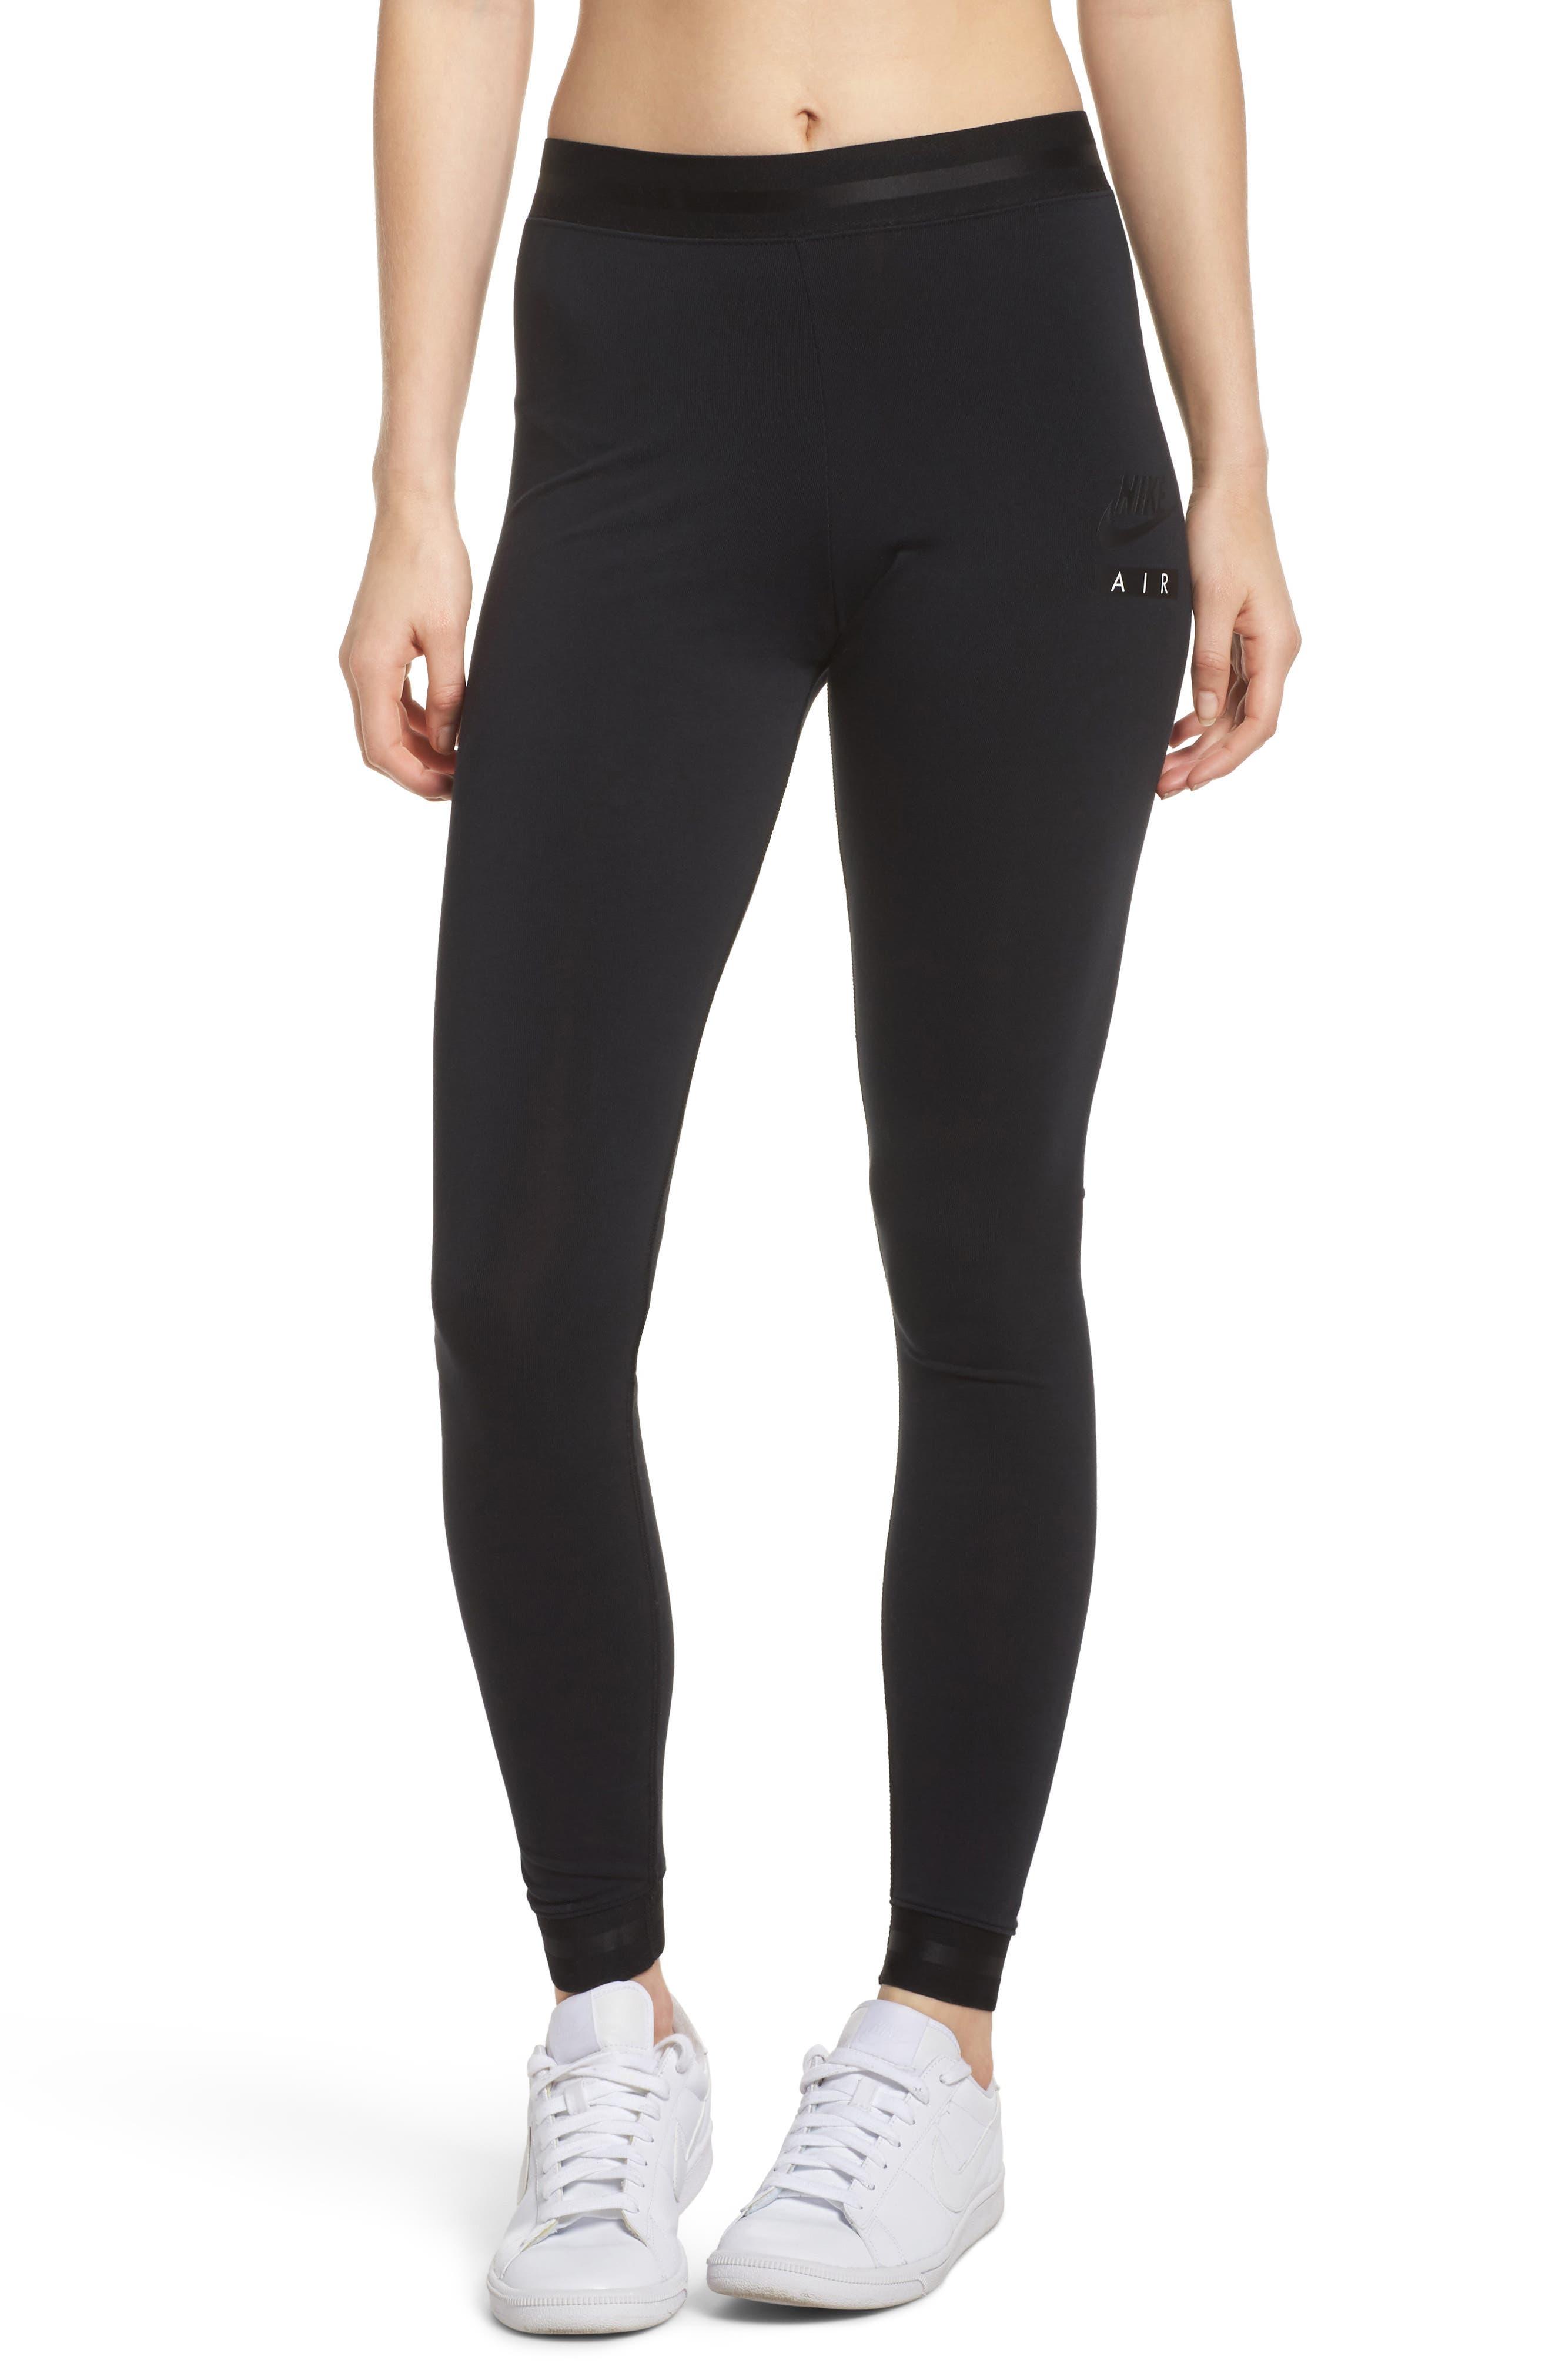 Sportswear Women's Leggings,                             Alternate thumbnail 3, color,                             BLACK/ BLACK/ BLACK